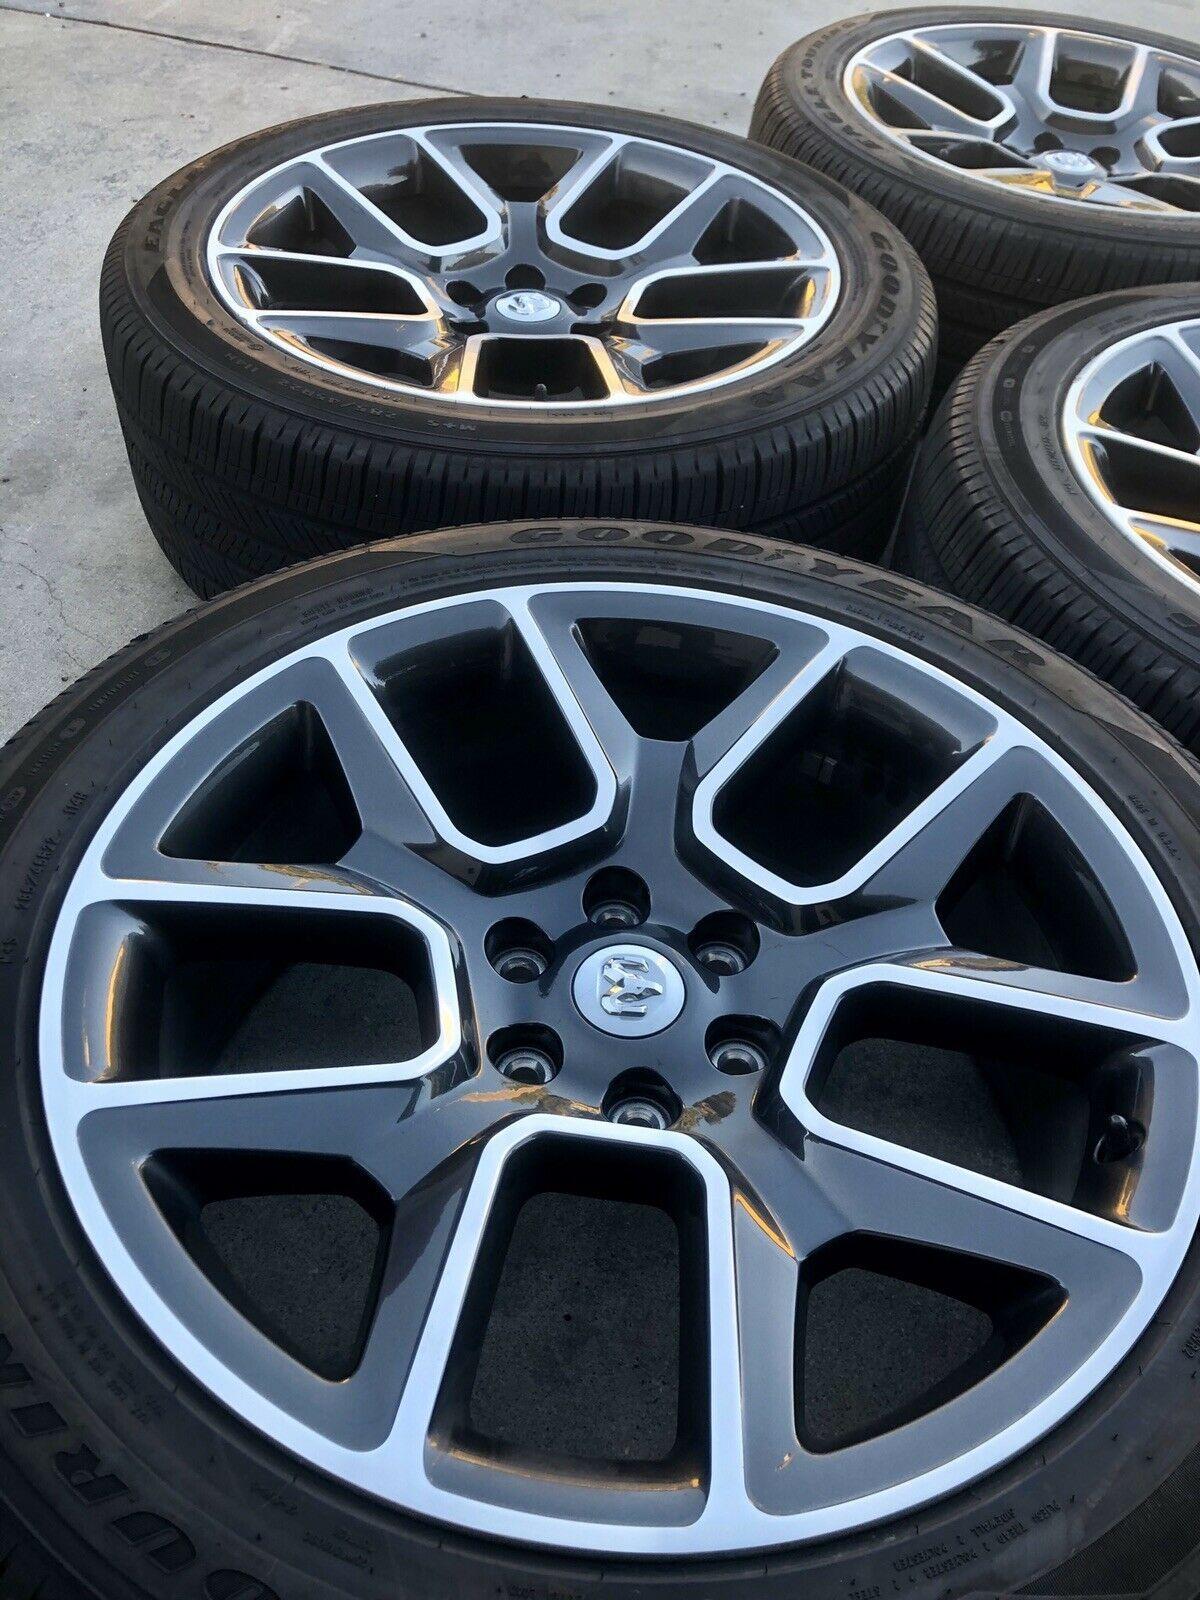 2020 Ram 1500 24 Inch Wheels : wheels, Dodge, 1500,